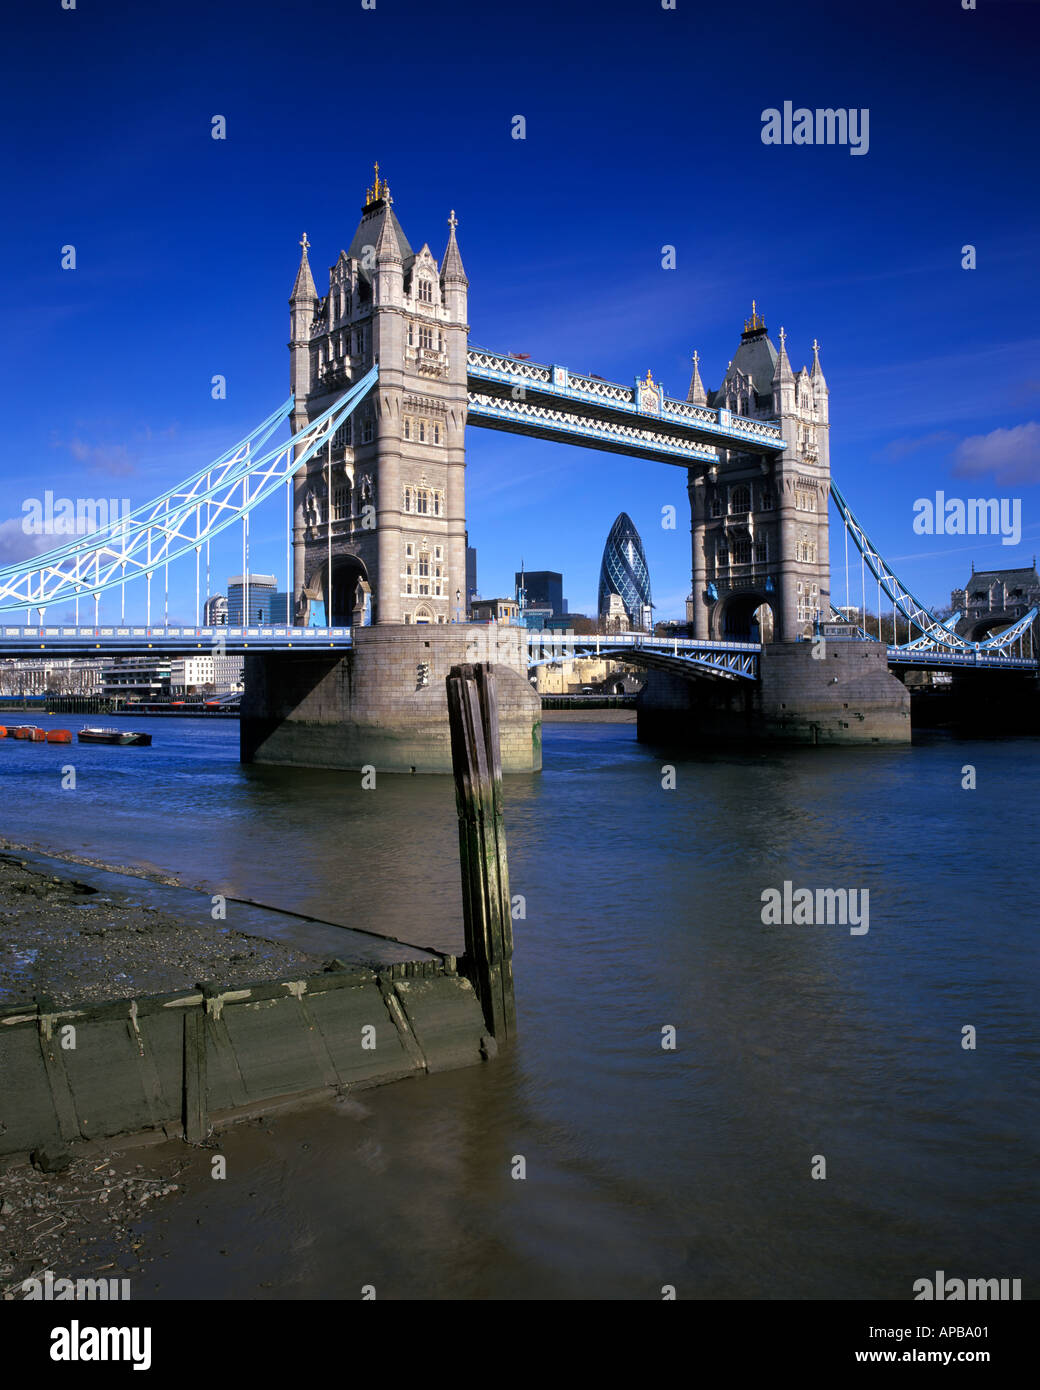 Tower Bridge London United Kingdom - Stock Image